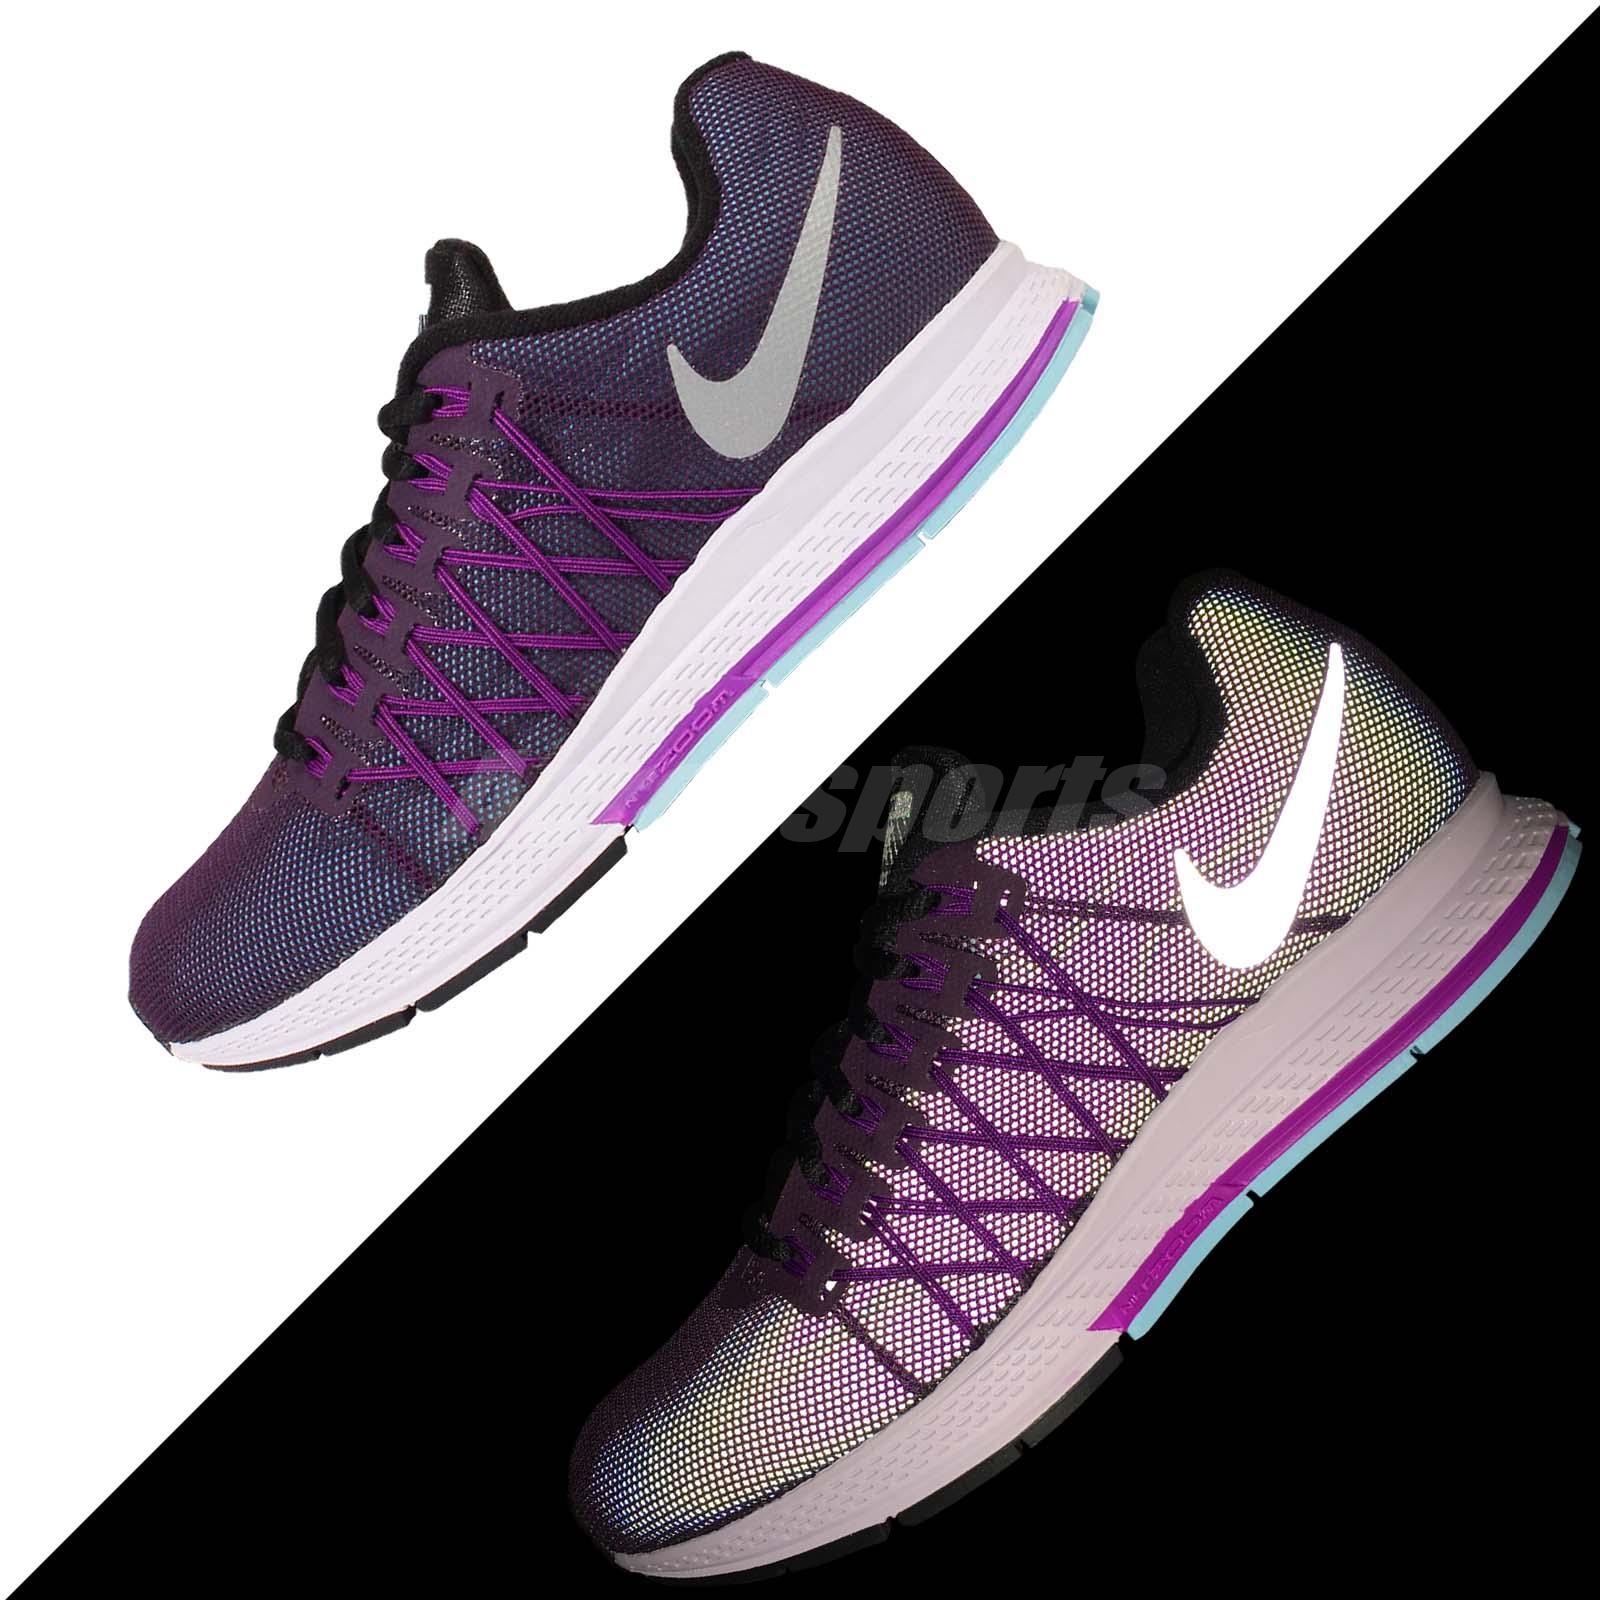 nike zoom pegasus 32 purple extreme. Black Bedroom Furniture Sets. Home Design Ideas